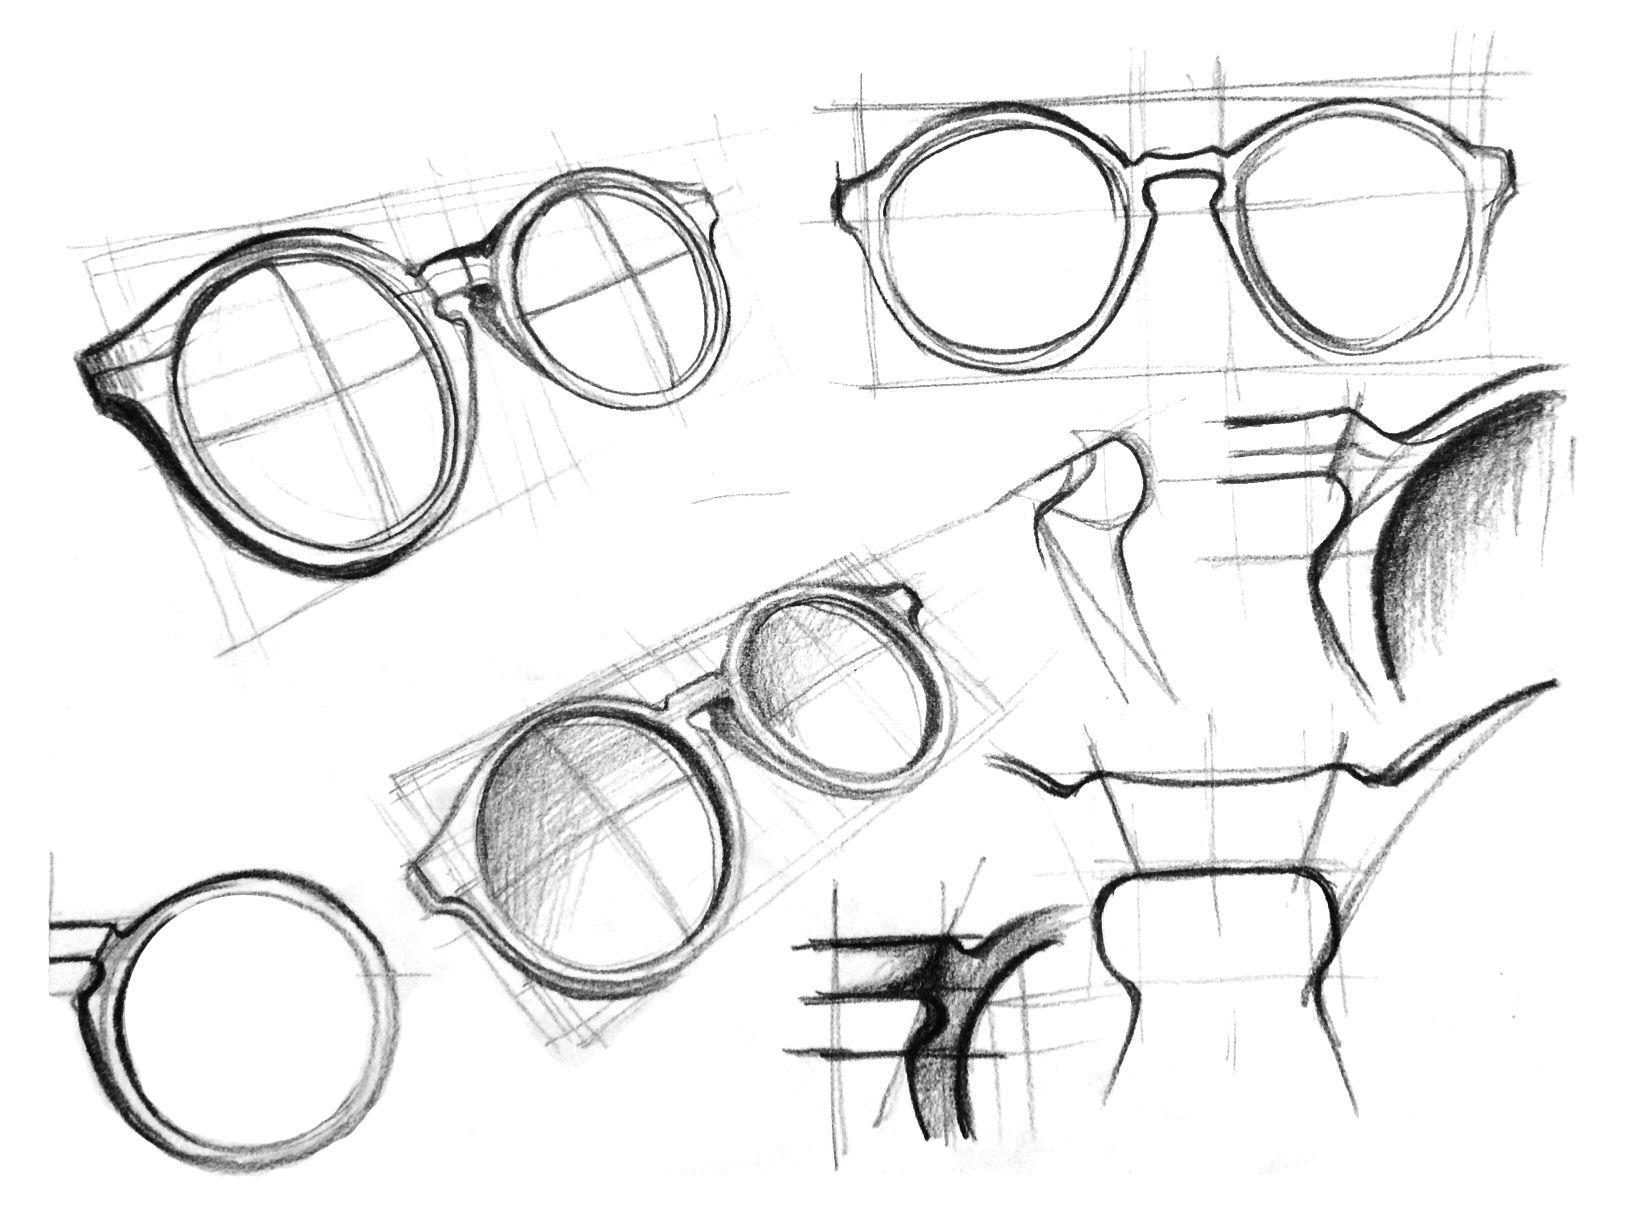 fd7a96ee829 Ralph Lauren sunglasses sketch